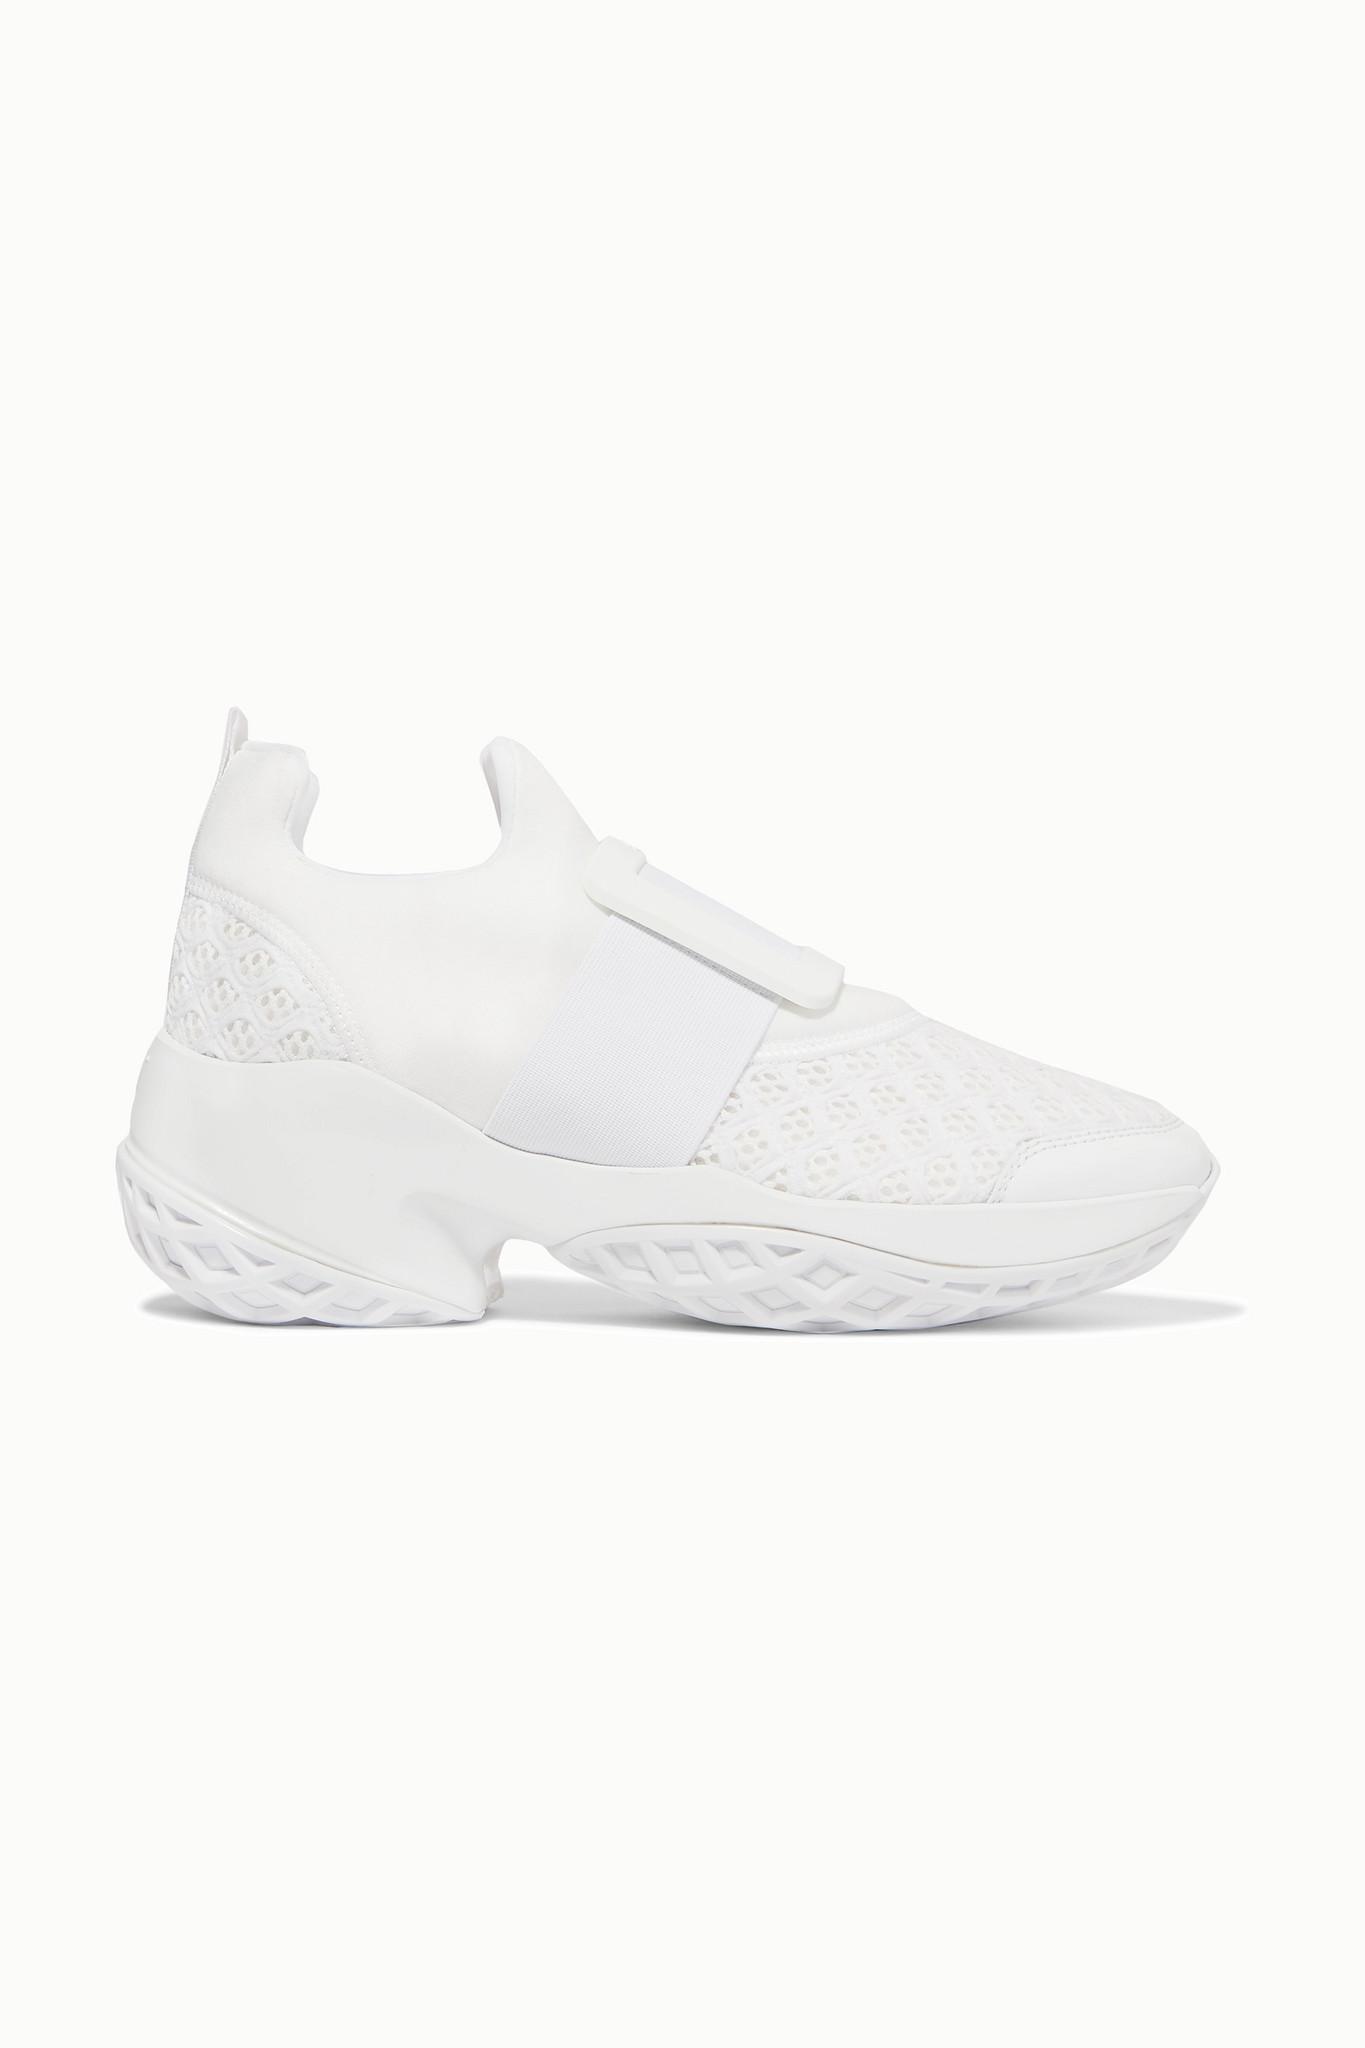 ROGER VIVIER - Viv Run 氯丁橡胶网眼皮革运动鞋 - 白色 - IT41